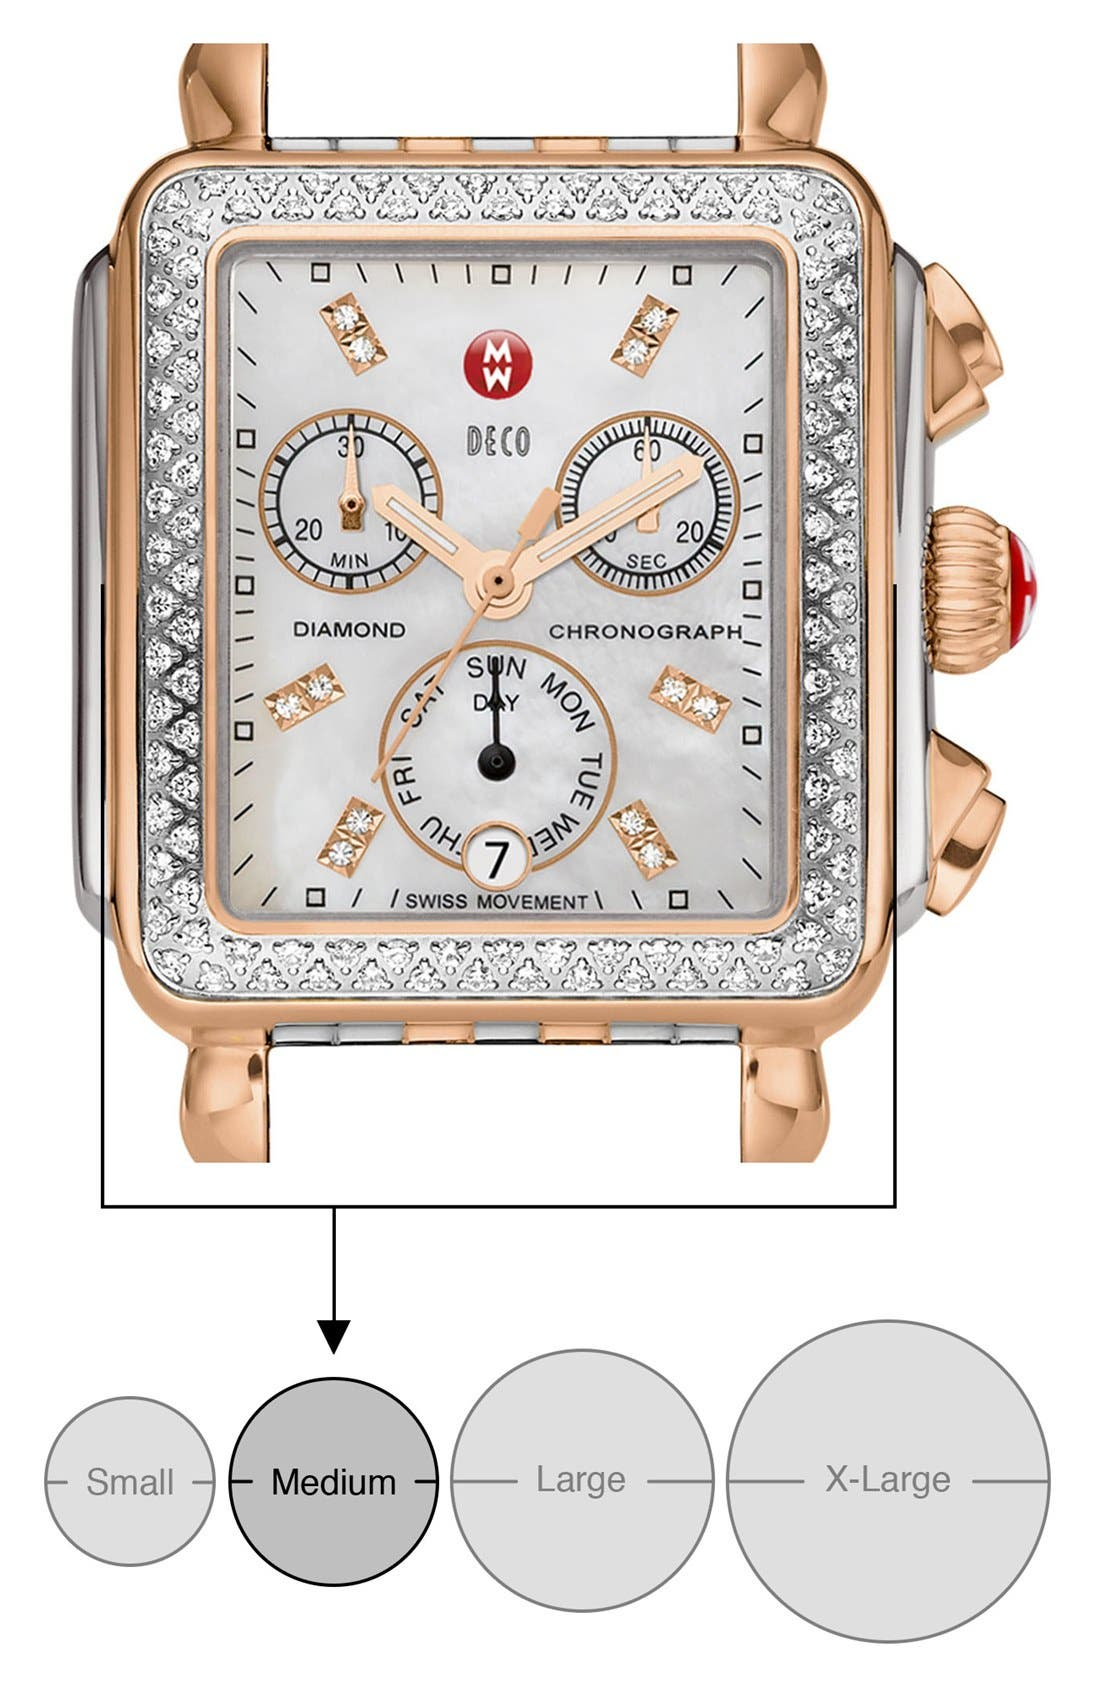 MICHELE, Deco Diamond Diamond Dial Watch Case, 33mm x 35mm, Alternate thumbnail 8, color, SILVER/ ROSE GOLD